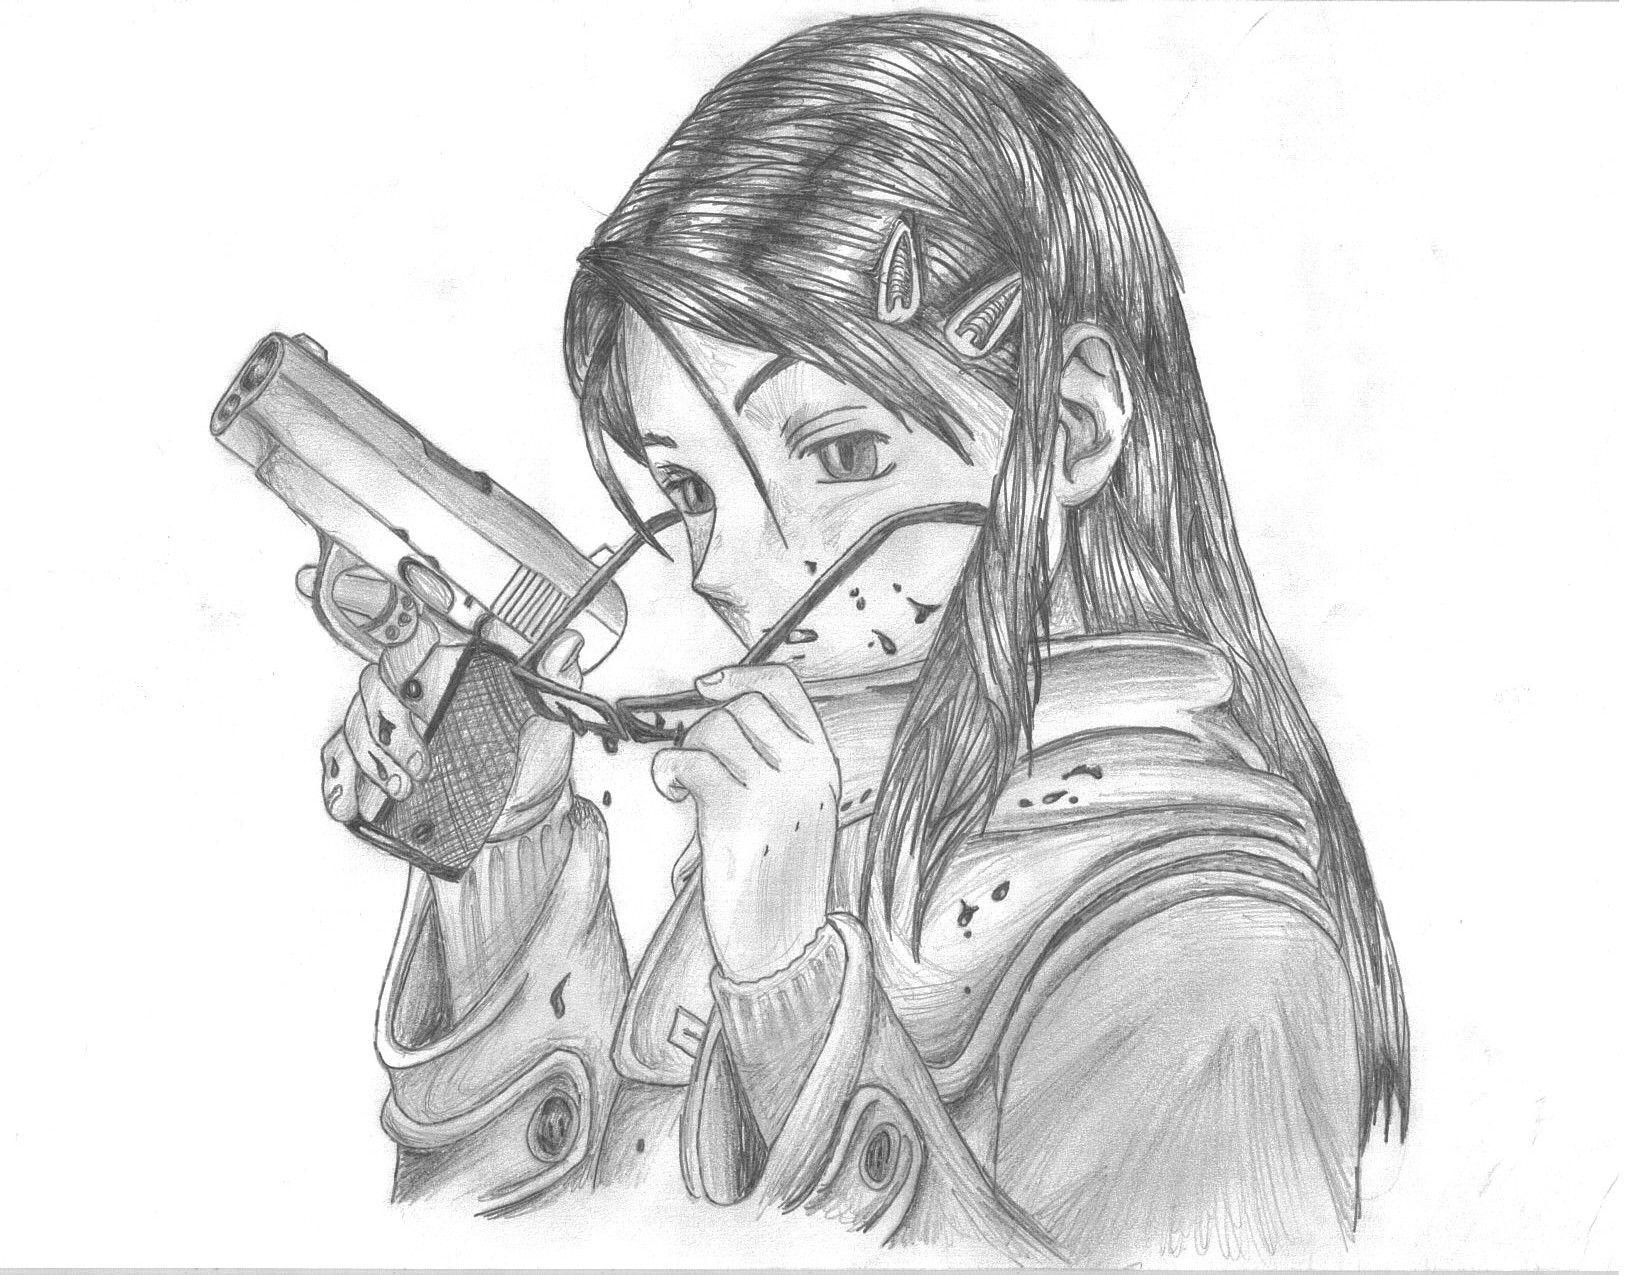 Sketch Of Badass Women | Anime Girl With Gun By Iloveloyers | Mind Weasels | Pinterest | Anime ...